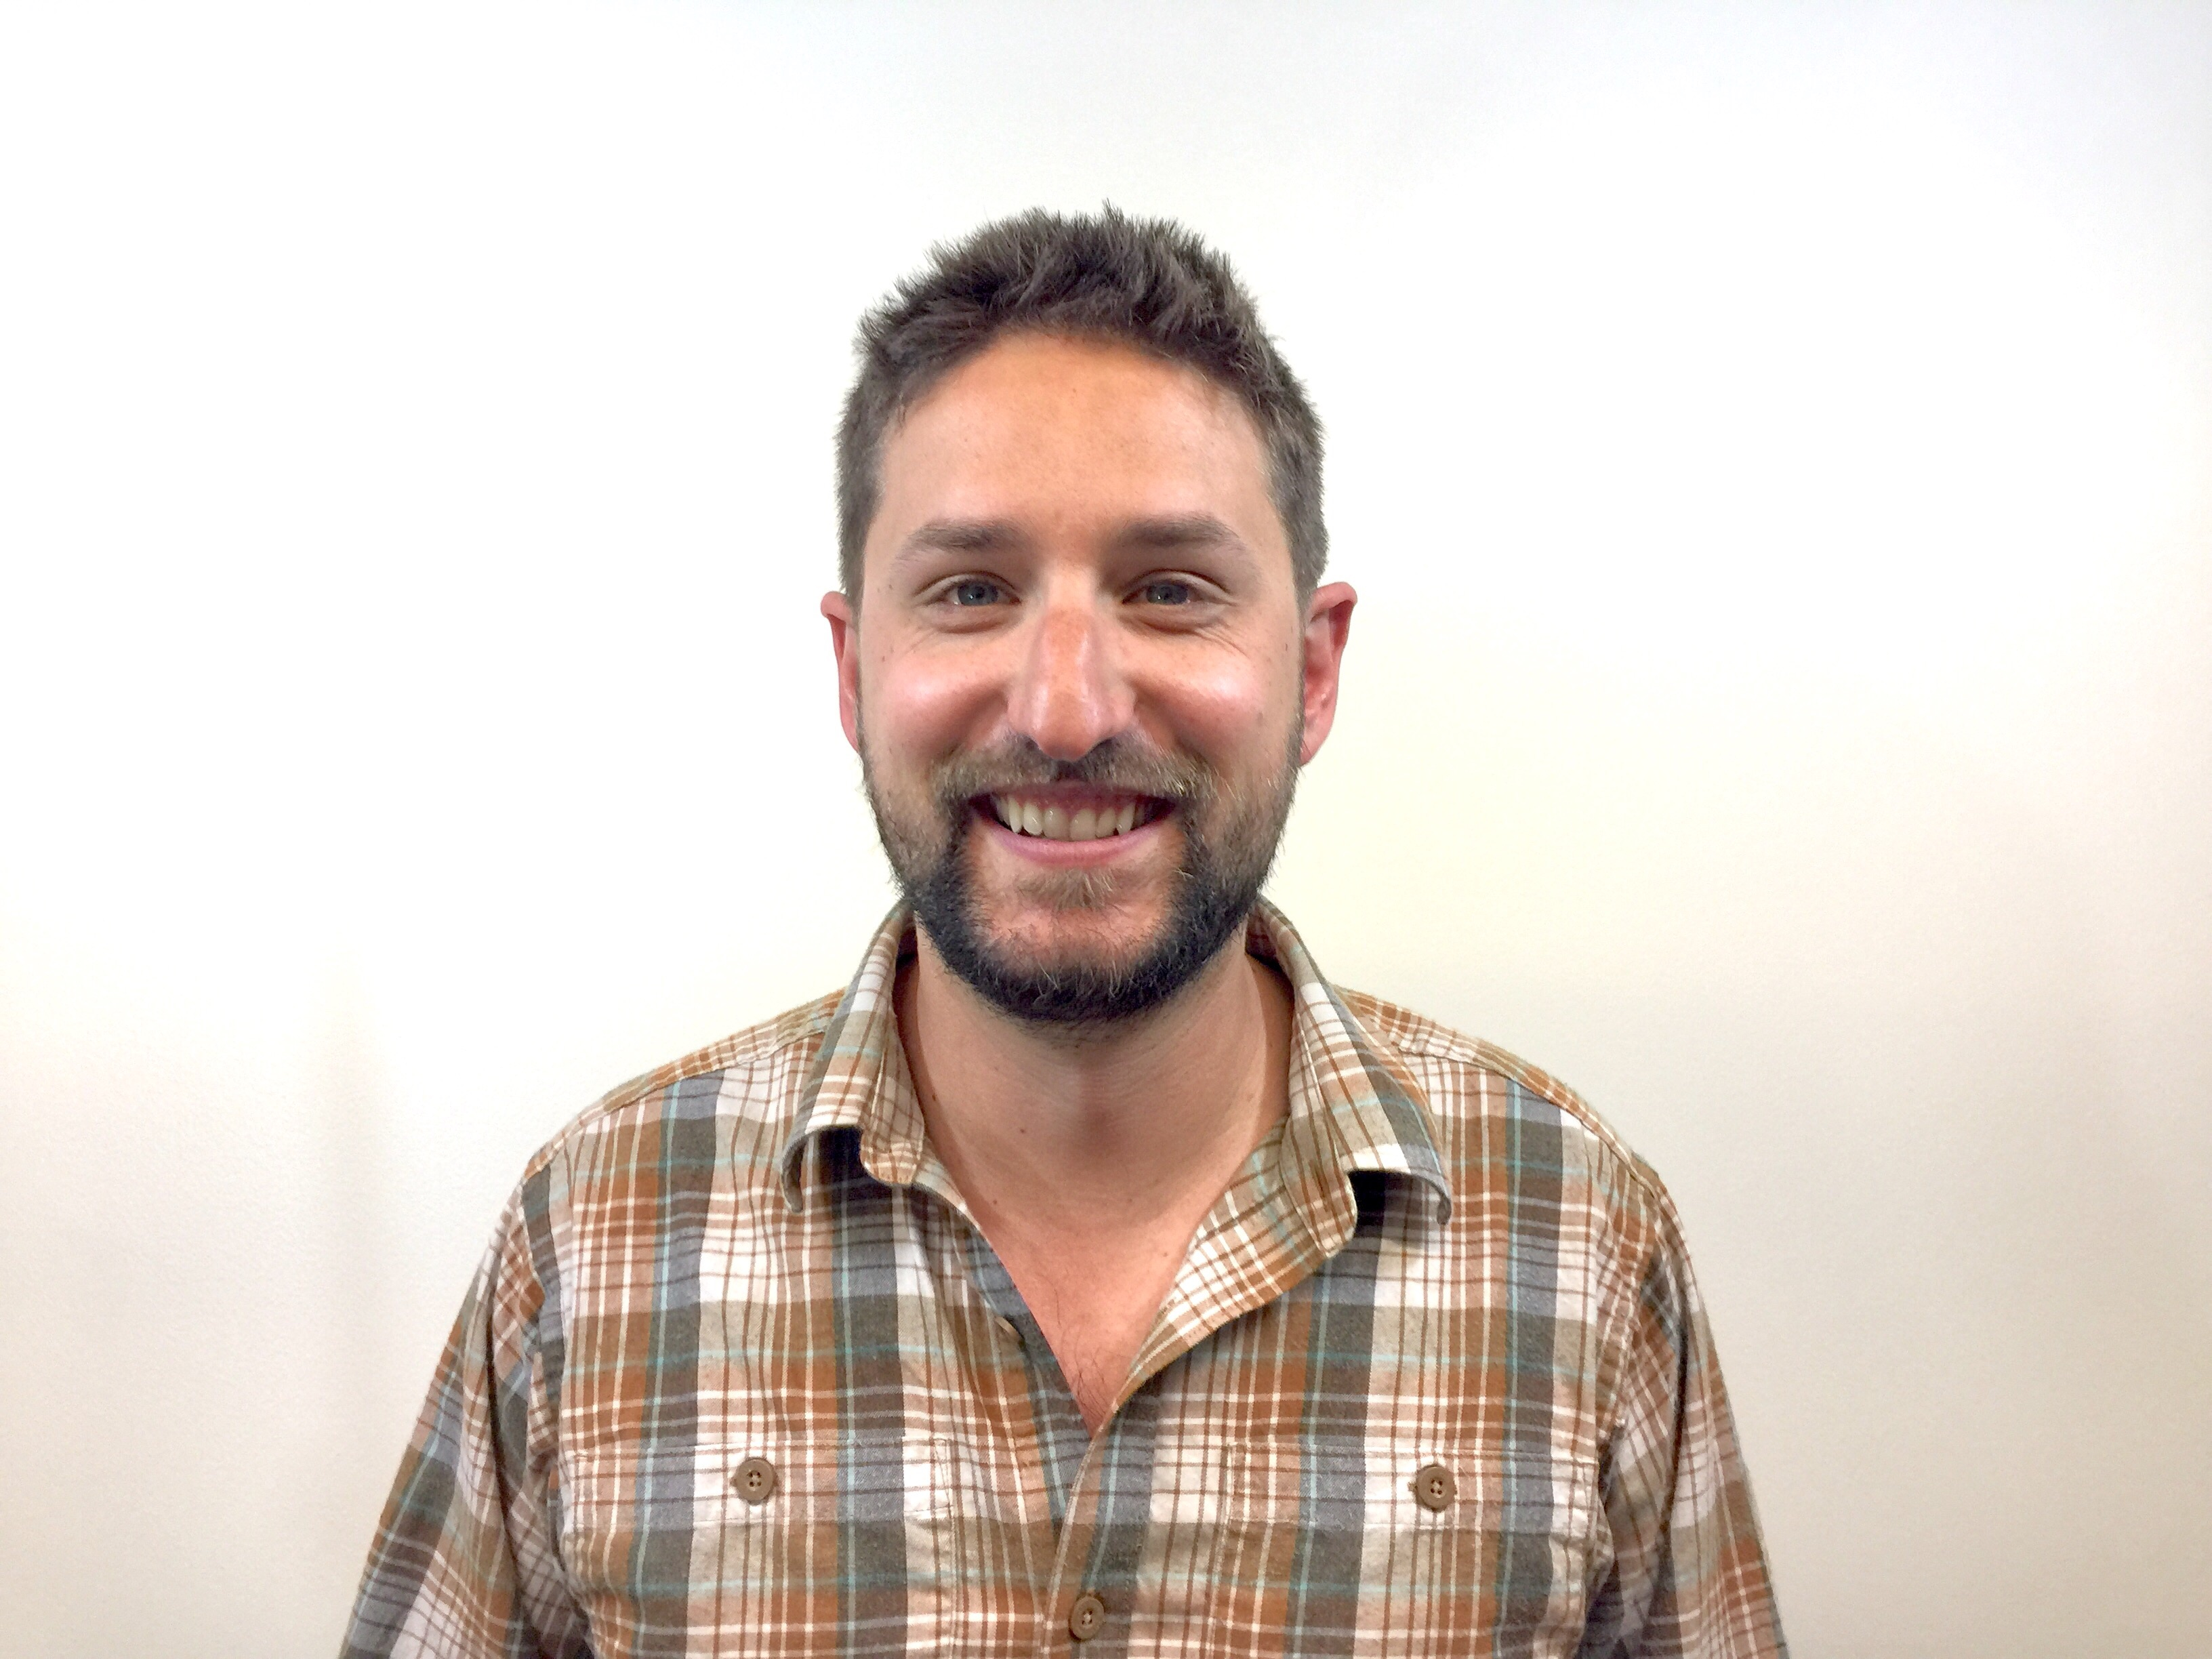 Gregg Golembeski, CTO of Dor Technologies